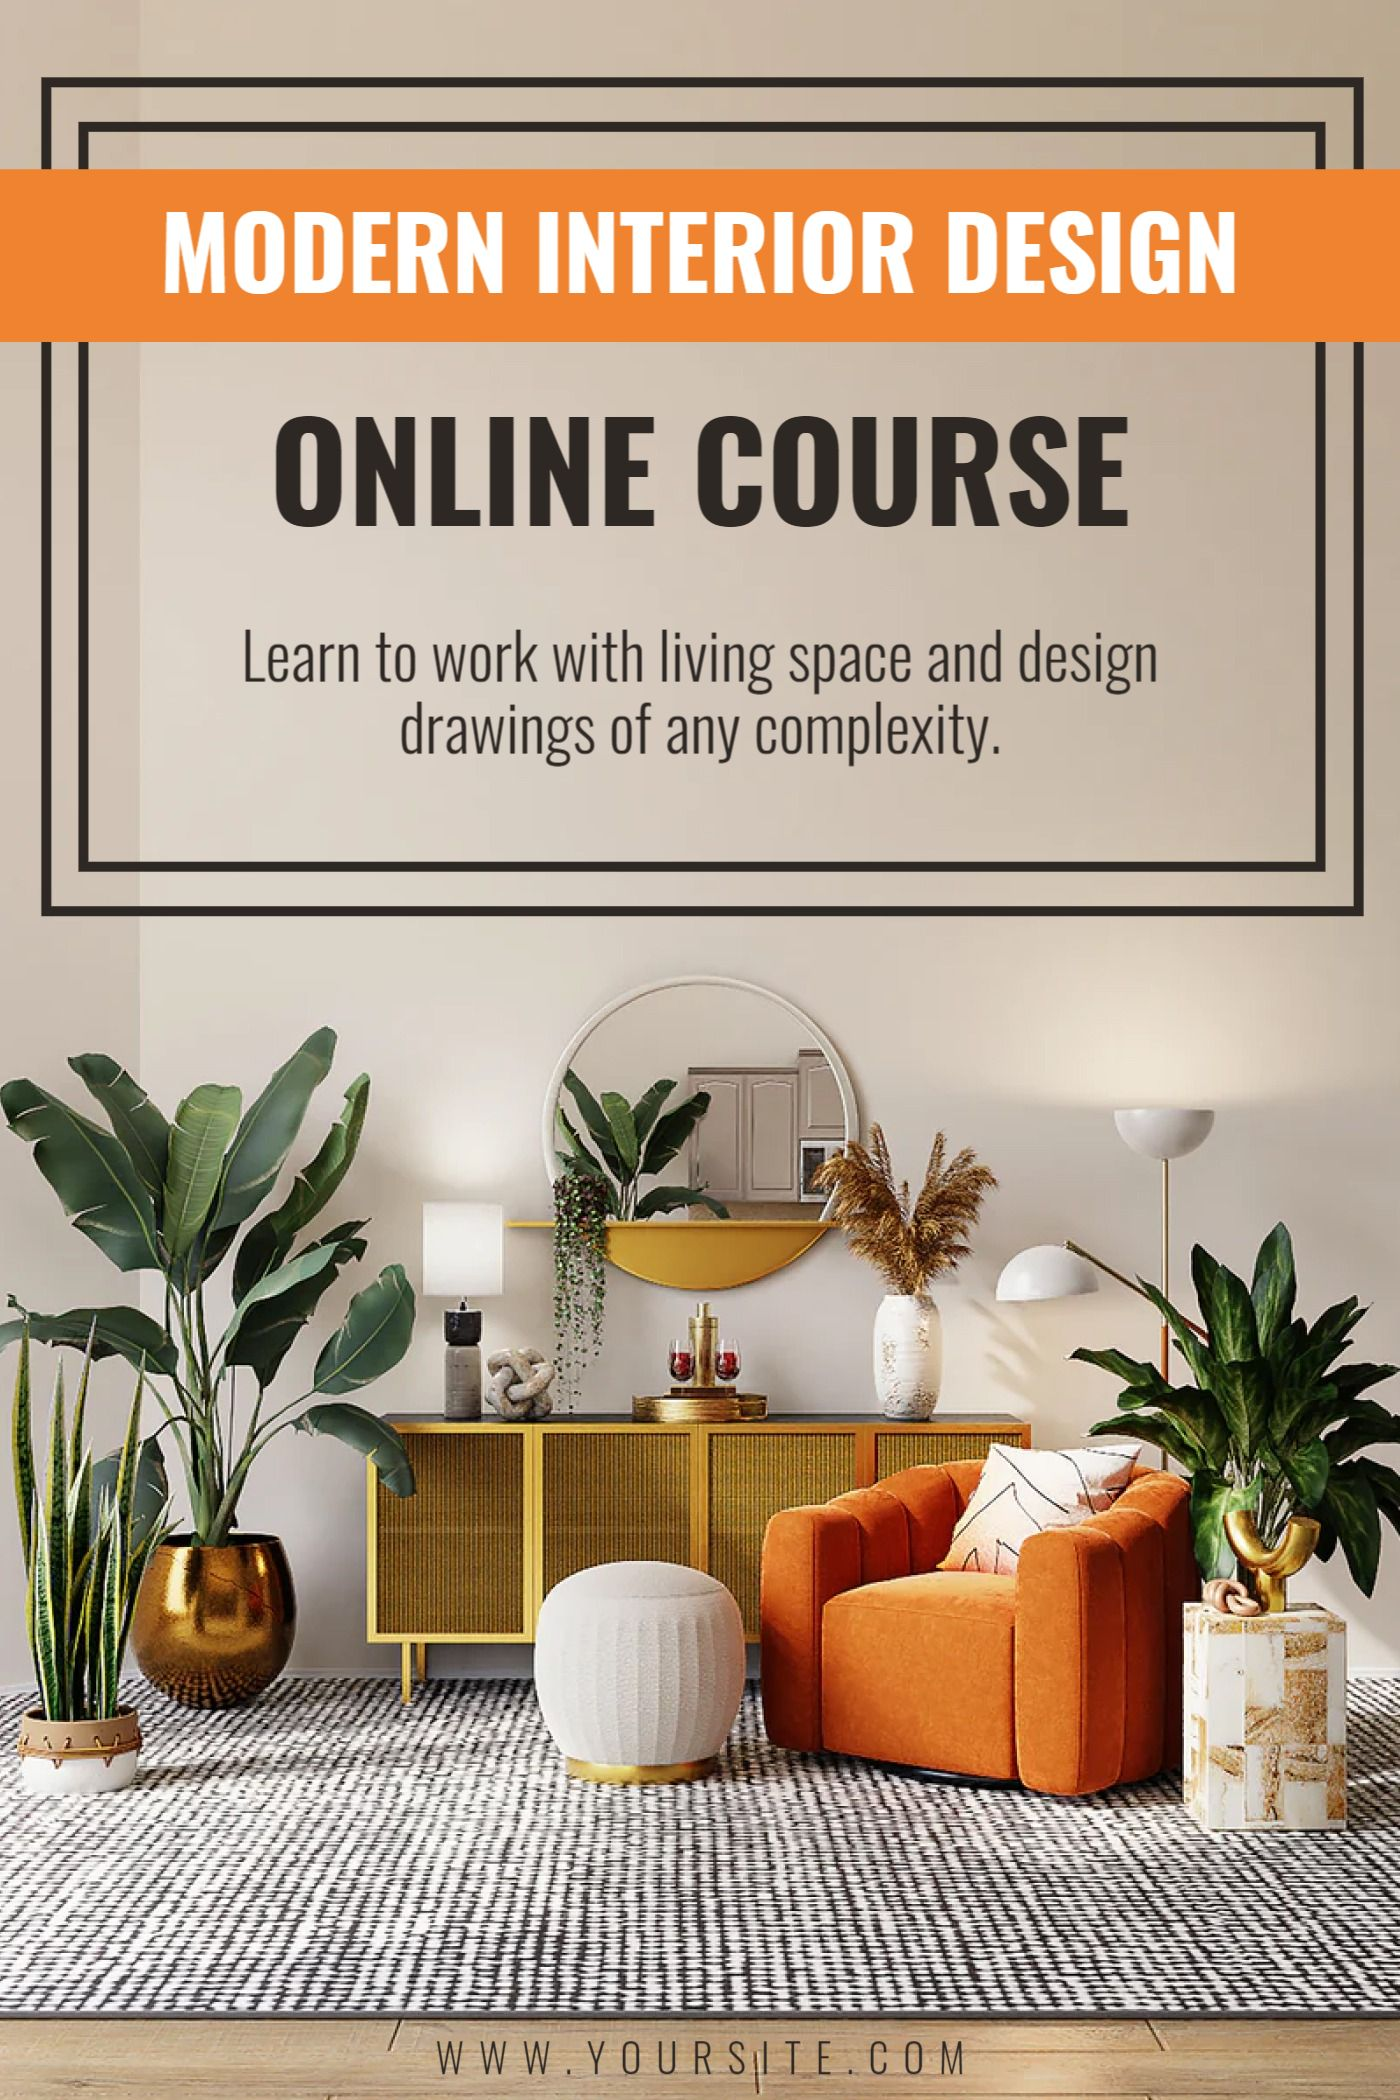 Online Interior Design Course Template